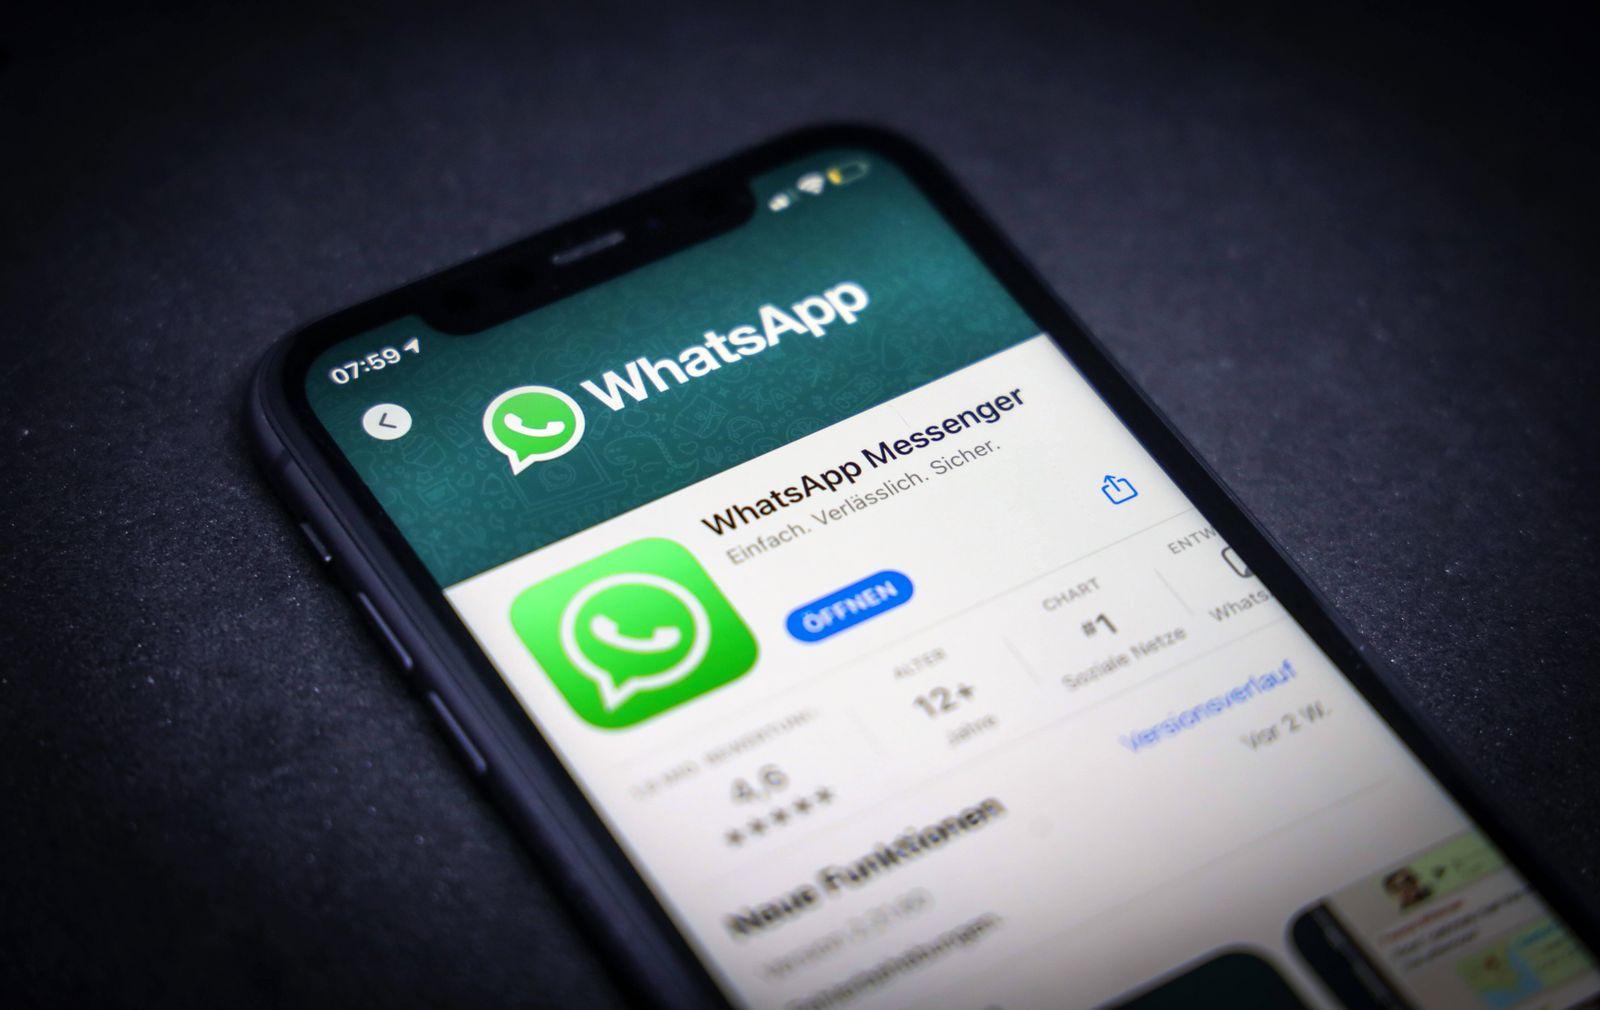 13.04.2021: Apple App Store auf einem iPhone. Apps-Charts. WhatsApp Messenger *** 13 04 2021 Apple App Store on an iPho